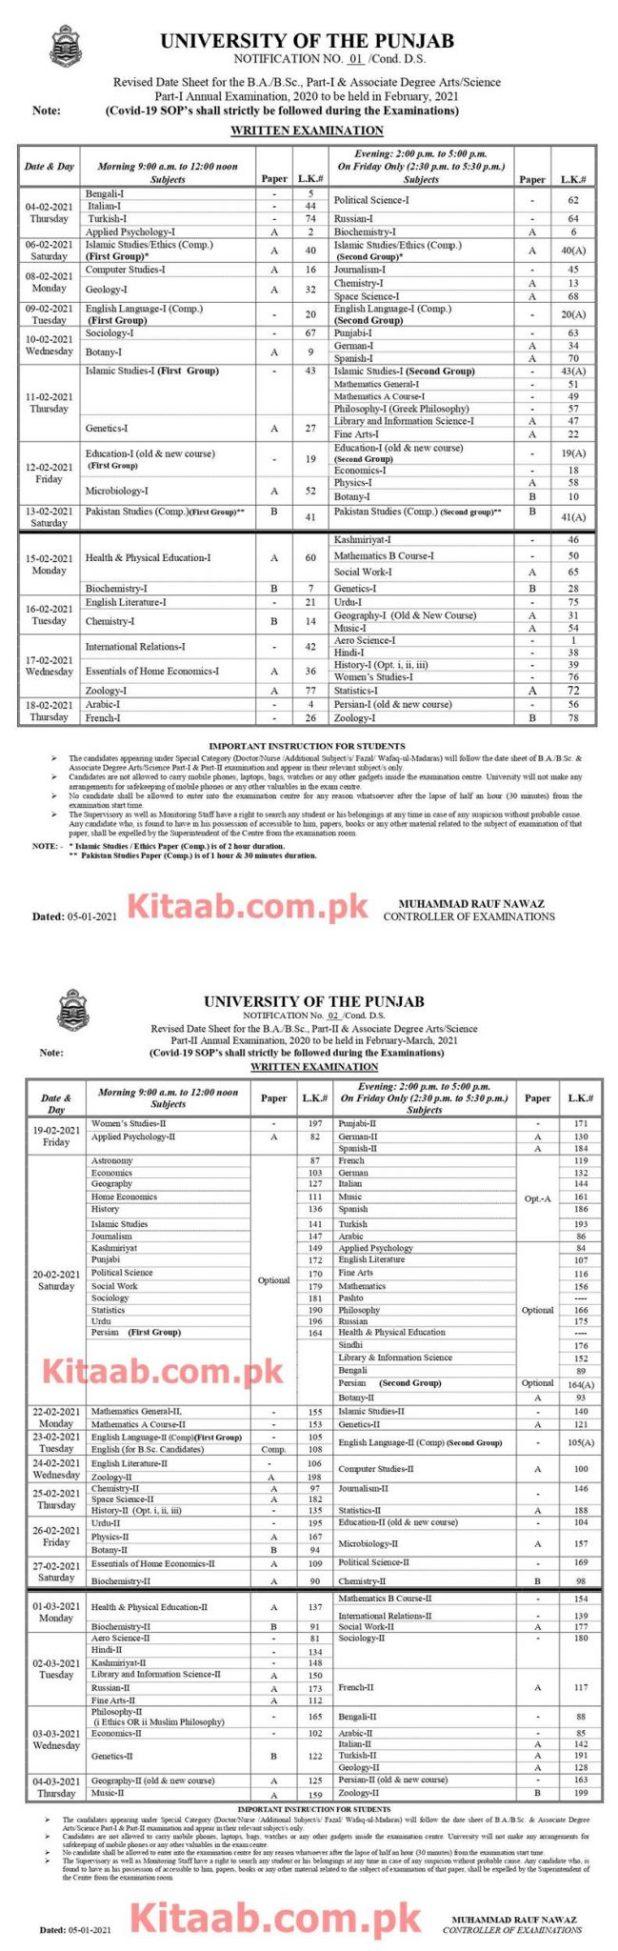 Punjab University BA BSc Date Sheet 2021 for Annual Exams pu.edu.pk